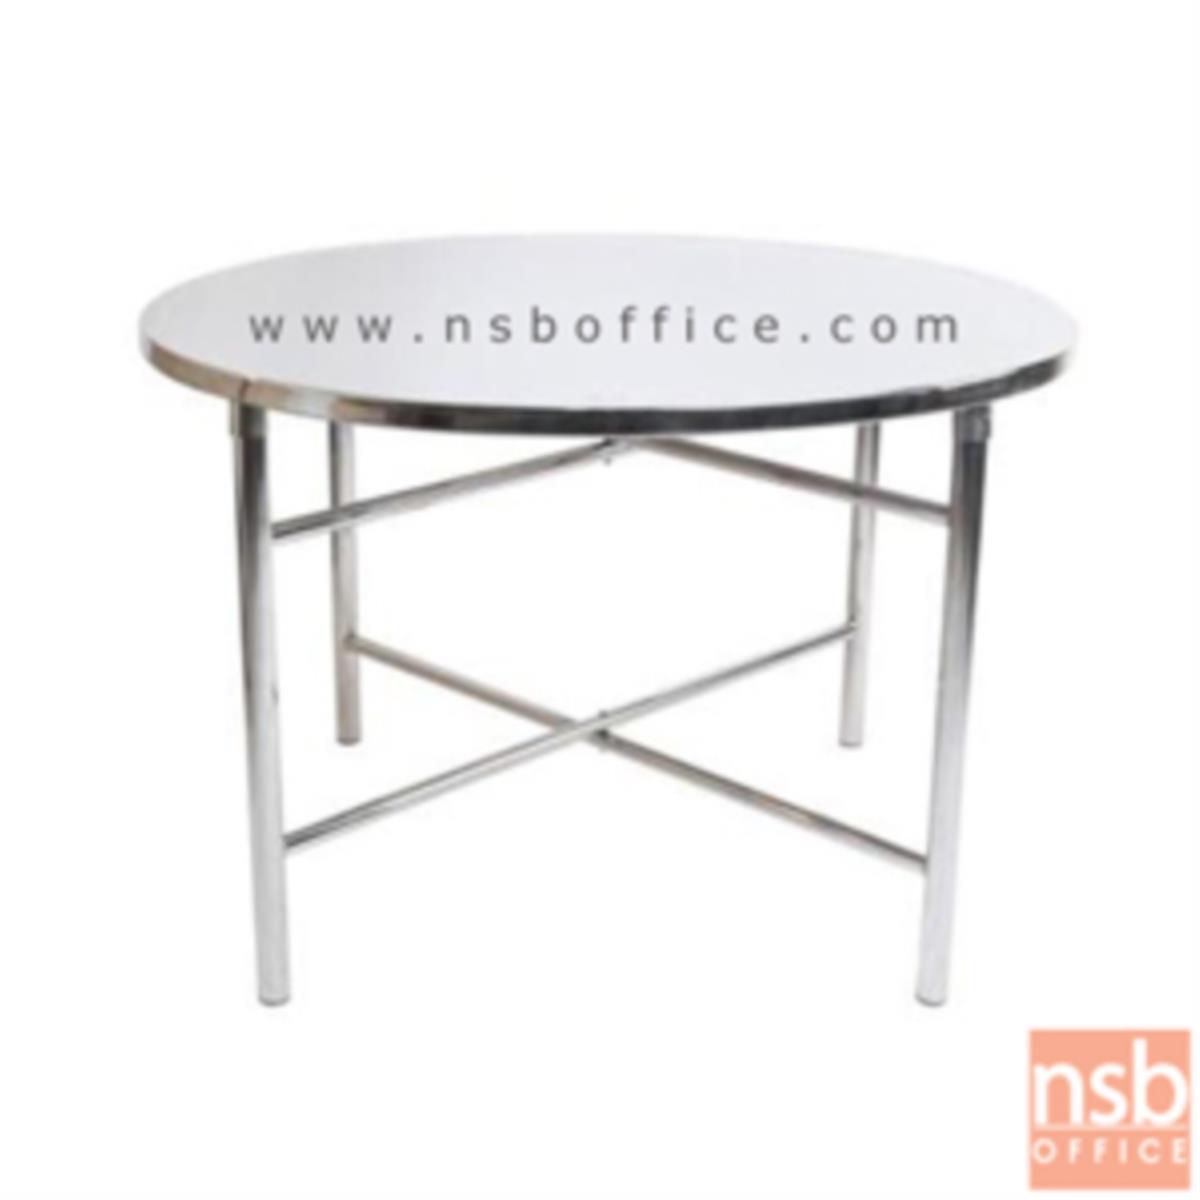 G12A102:โต๊ะหน้าสเตนเลส รุ่น Hodesh (โฮเดช) ขนาด 115Di cm.  ขาสเตนเลสถอดออกได้